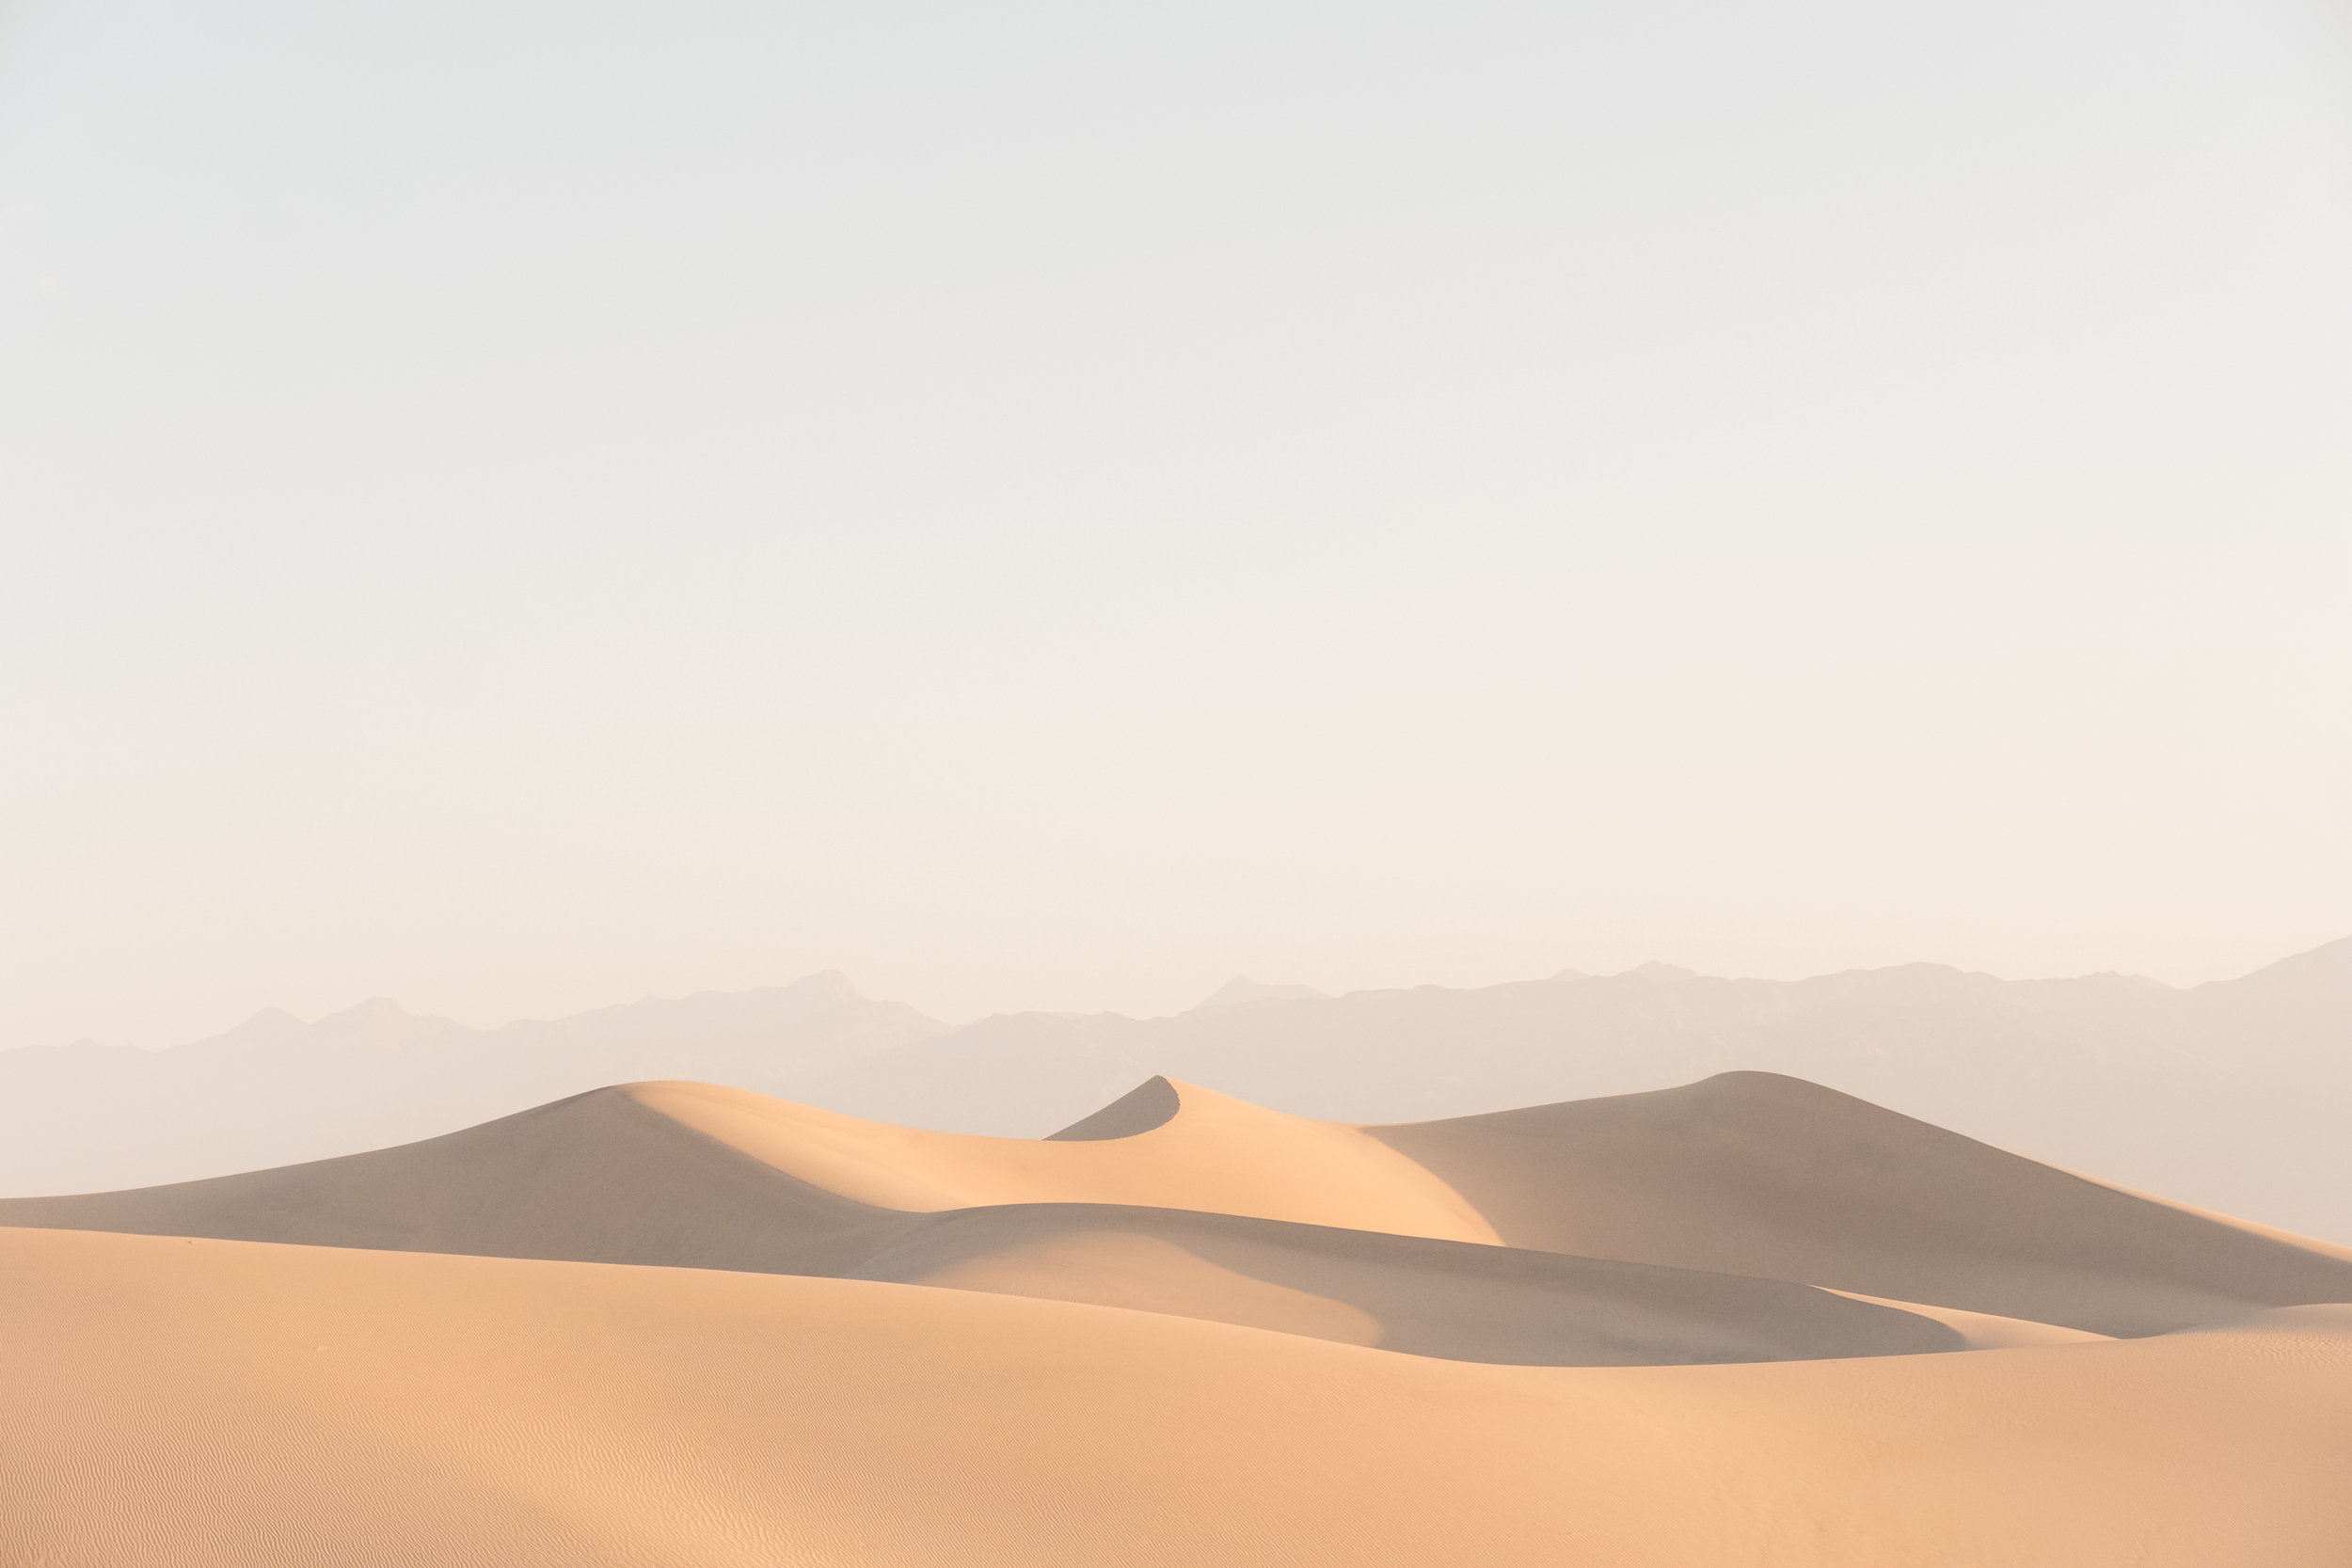 Death_Valley_National_Park12.jpg